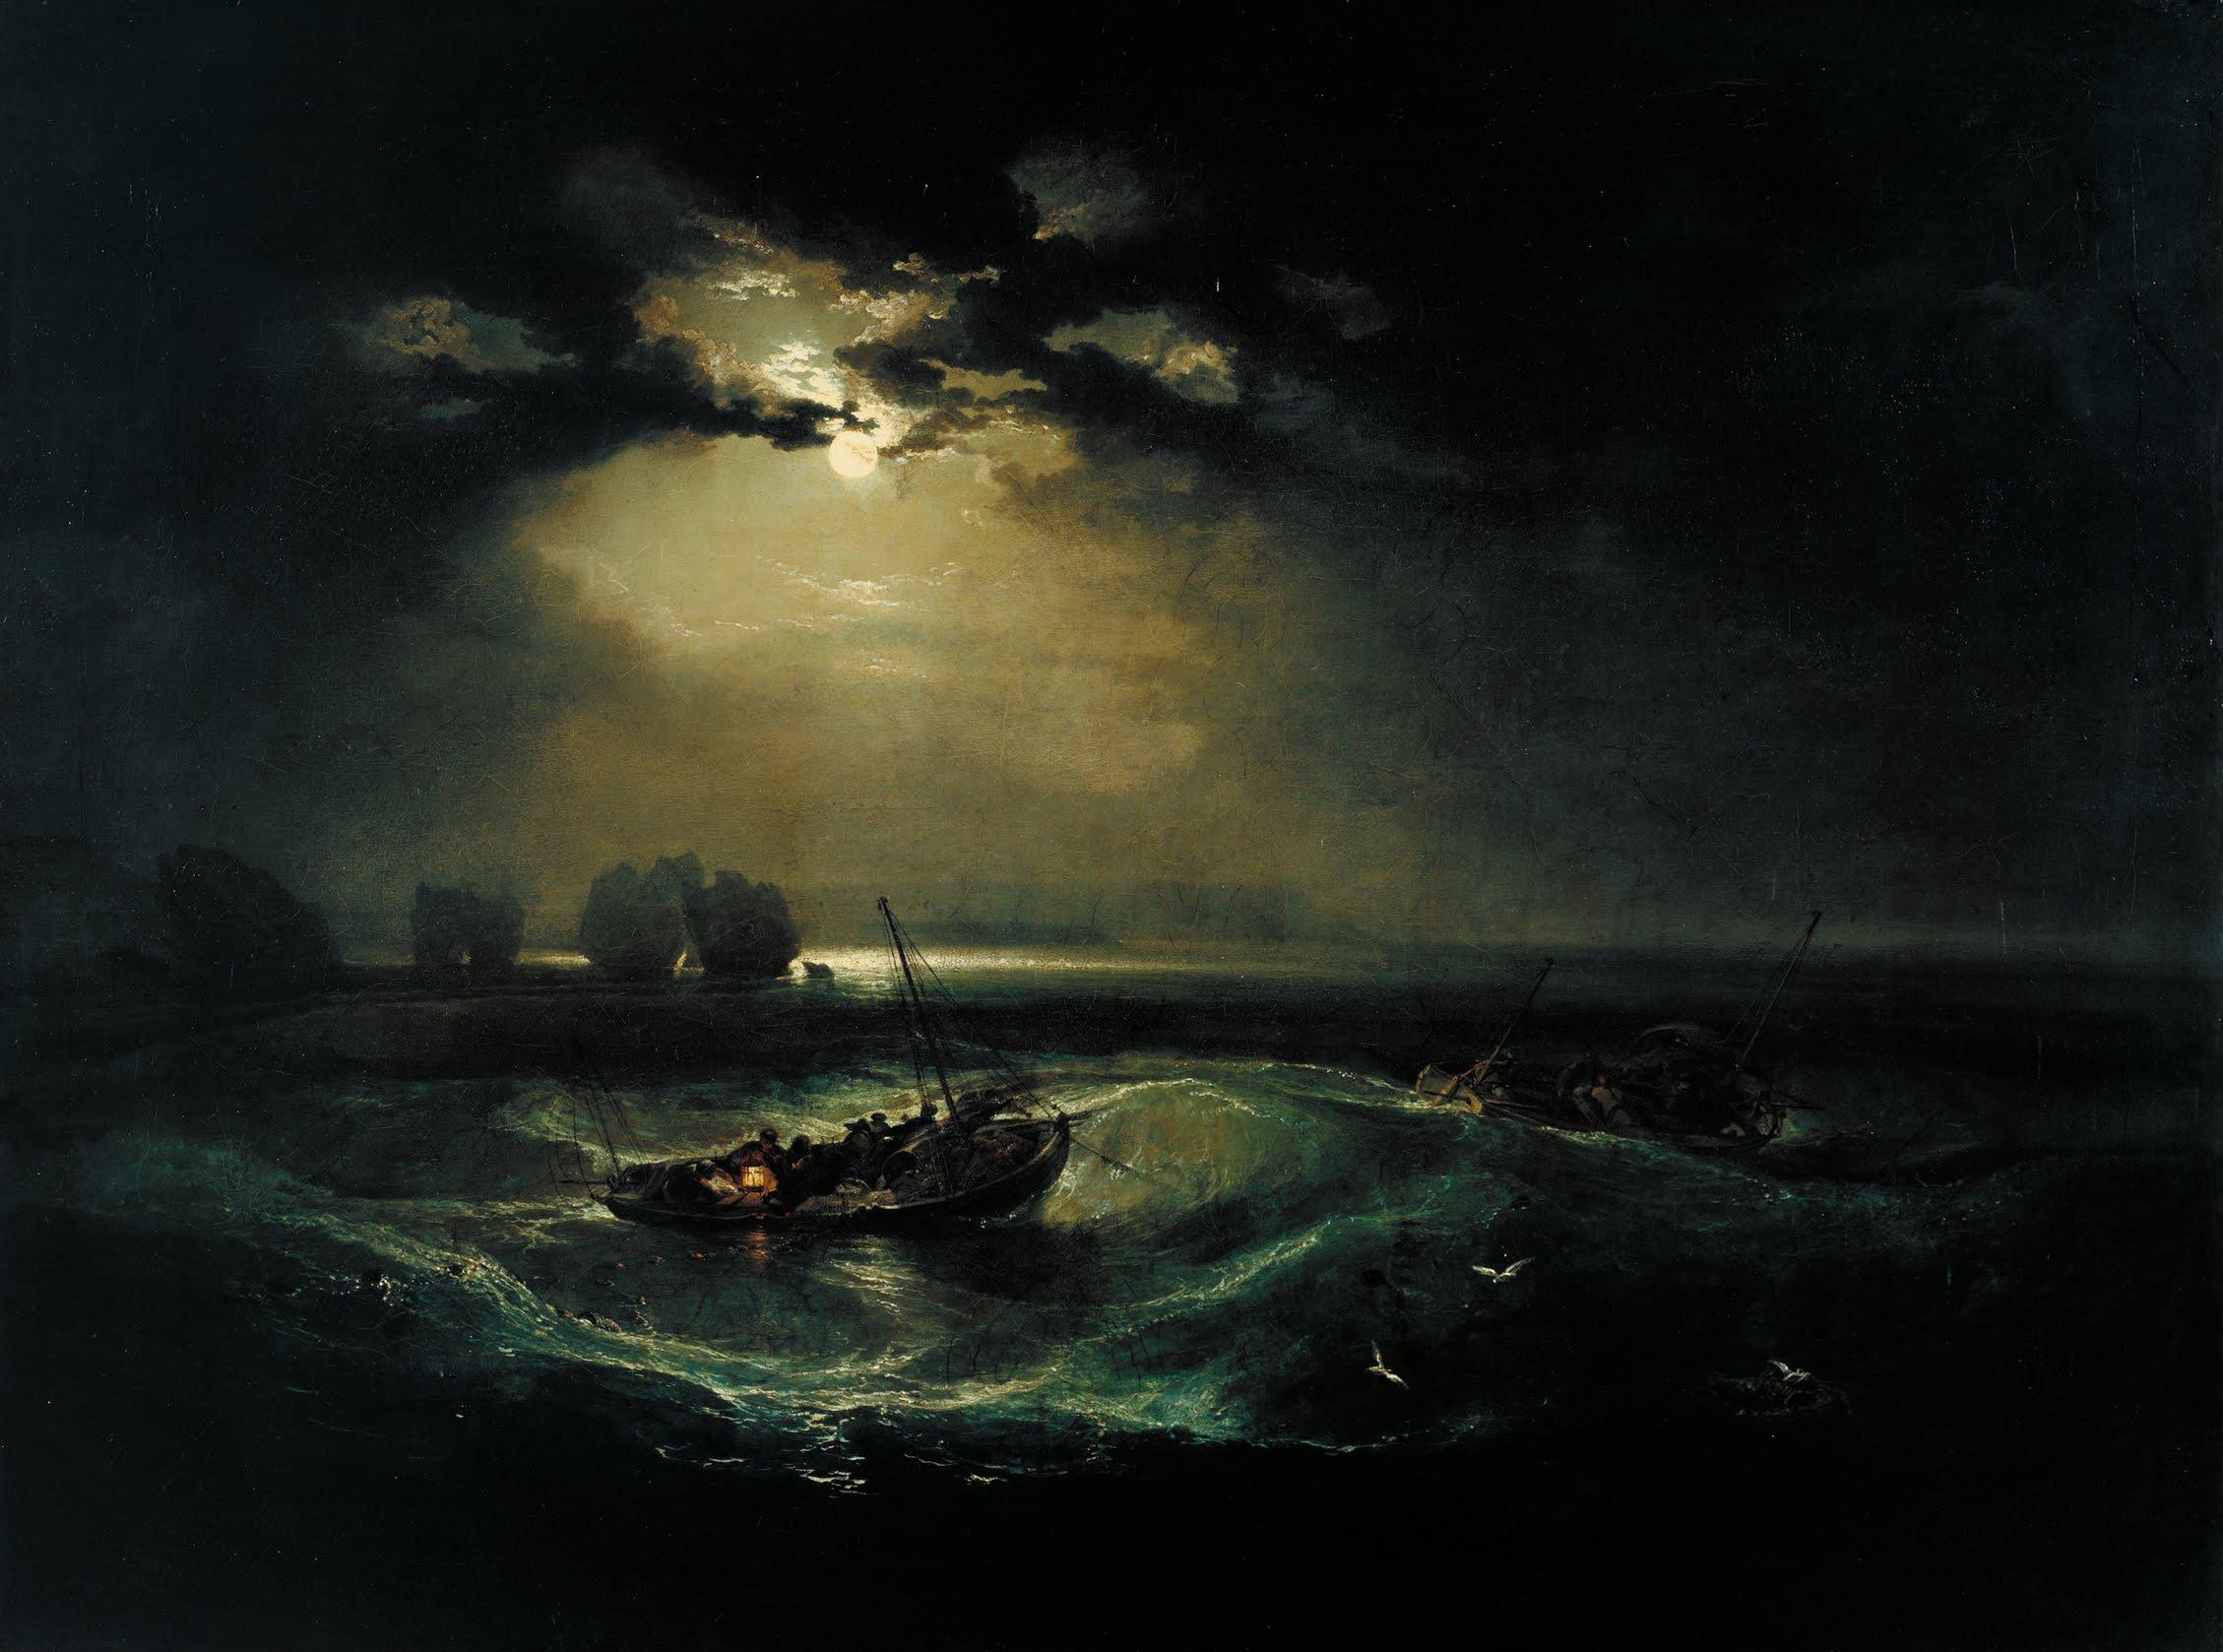 Joseph_Mallord_William_Turner_-_Fishermen_at_Sea_-_G